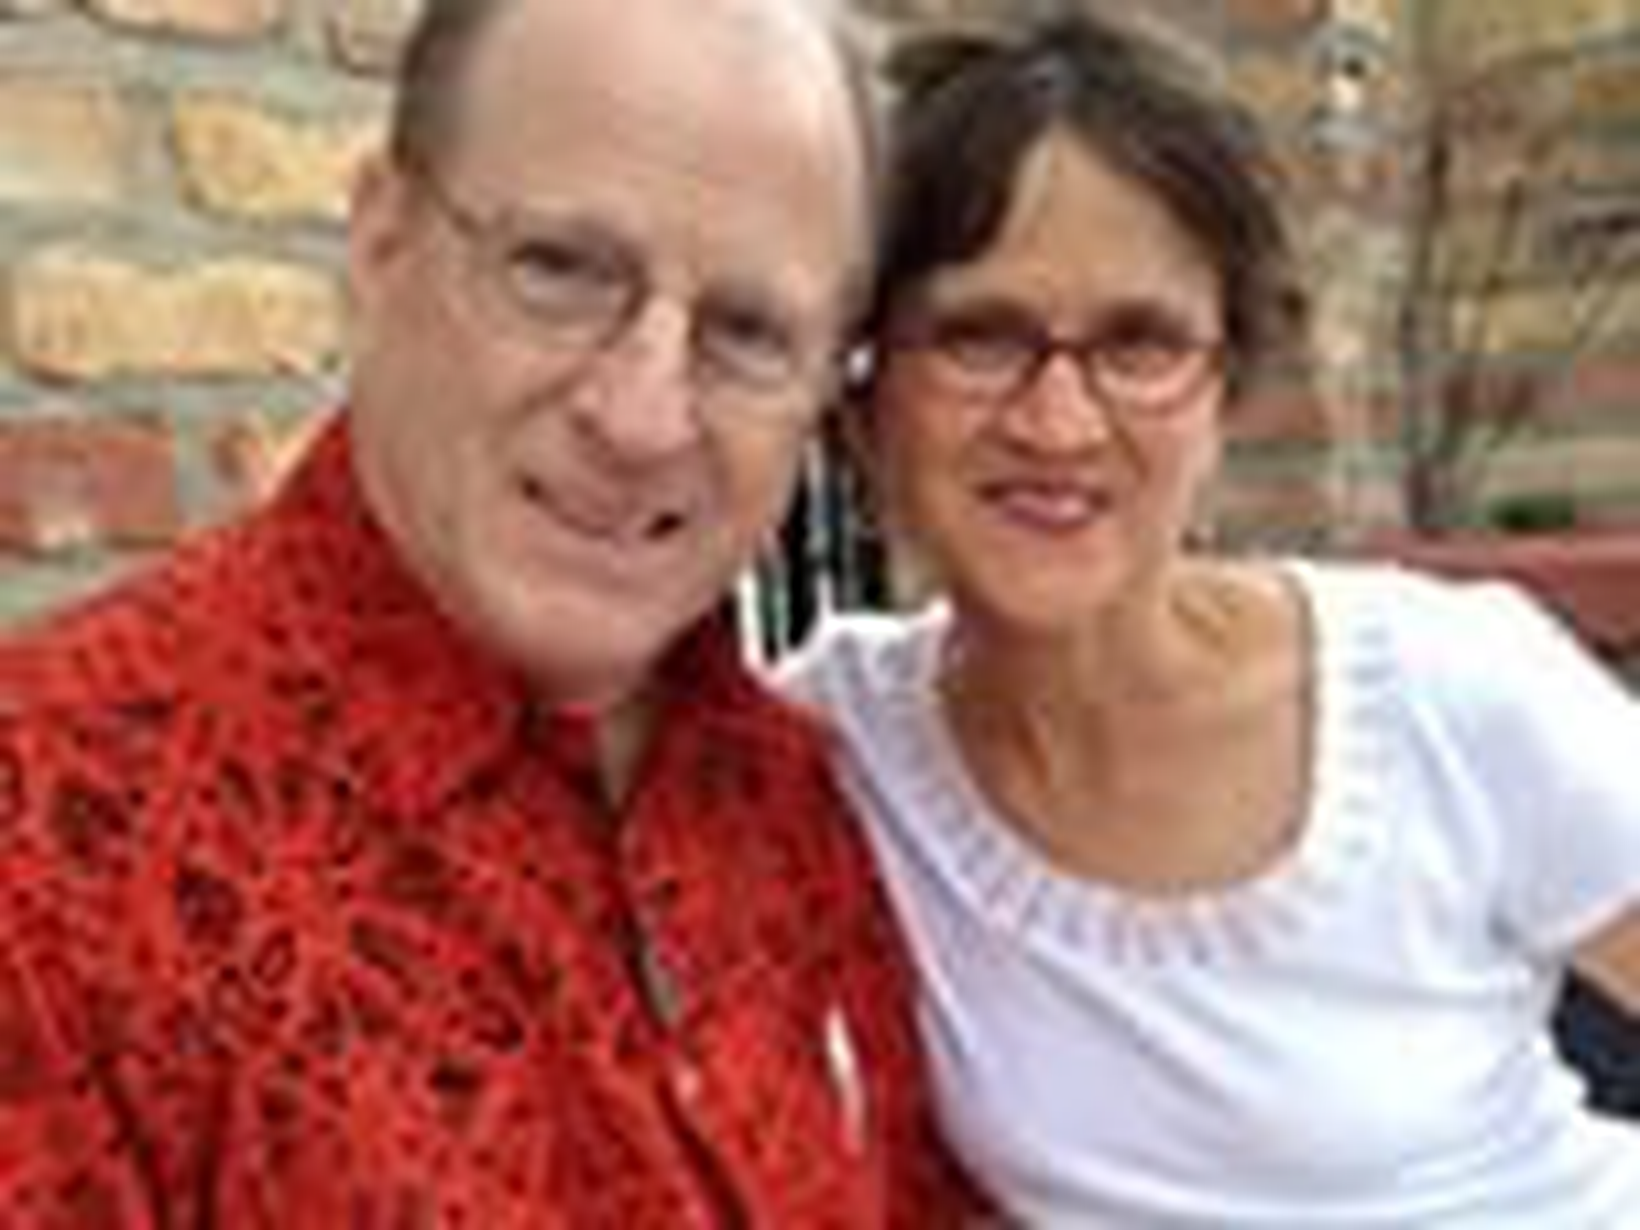 Preston & Mary from Saint Peter, Minnesota, United States